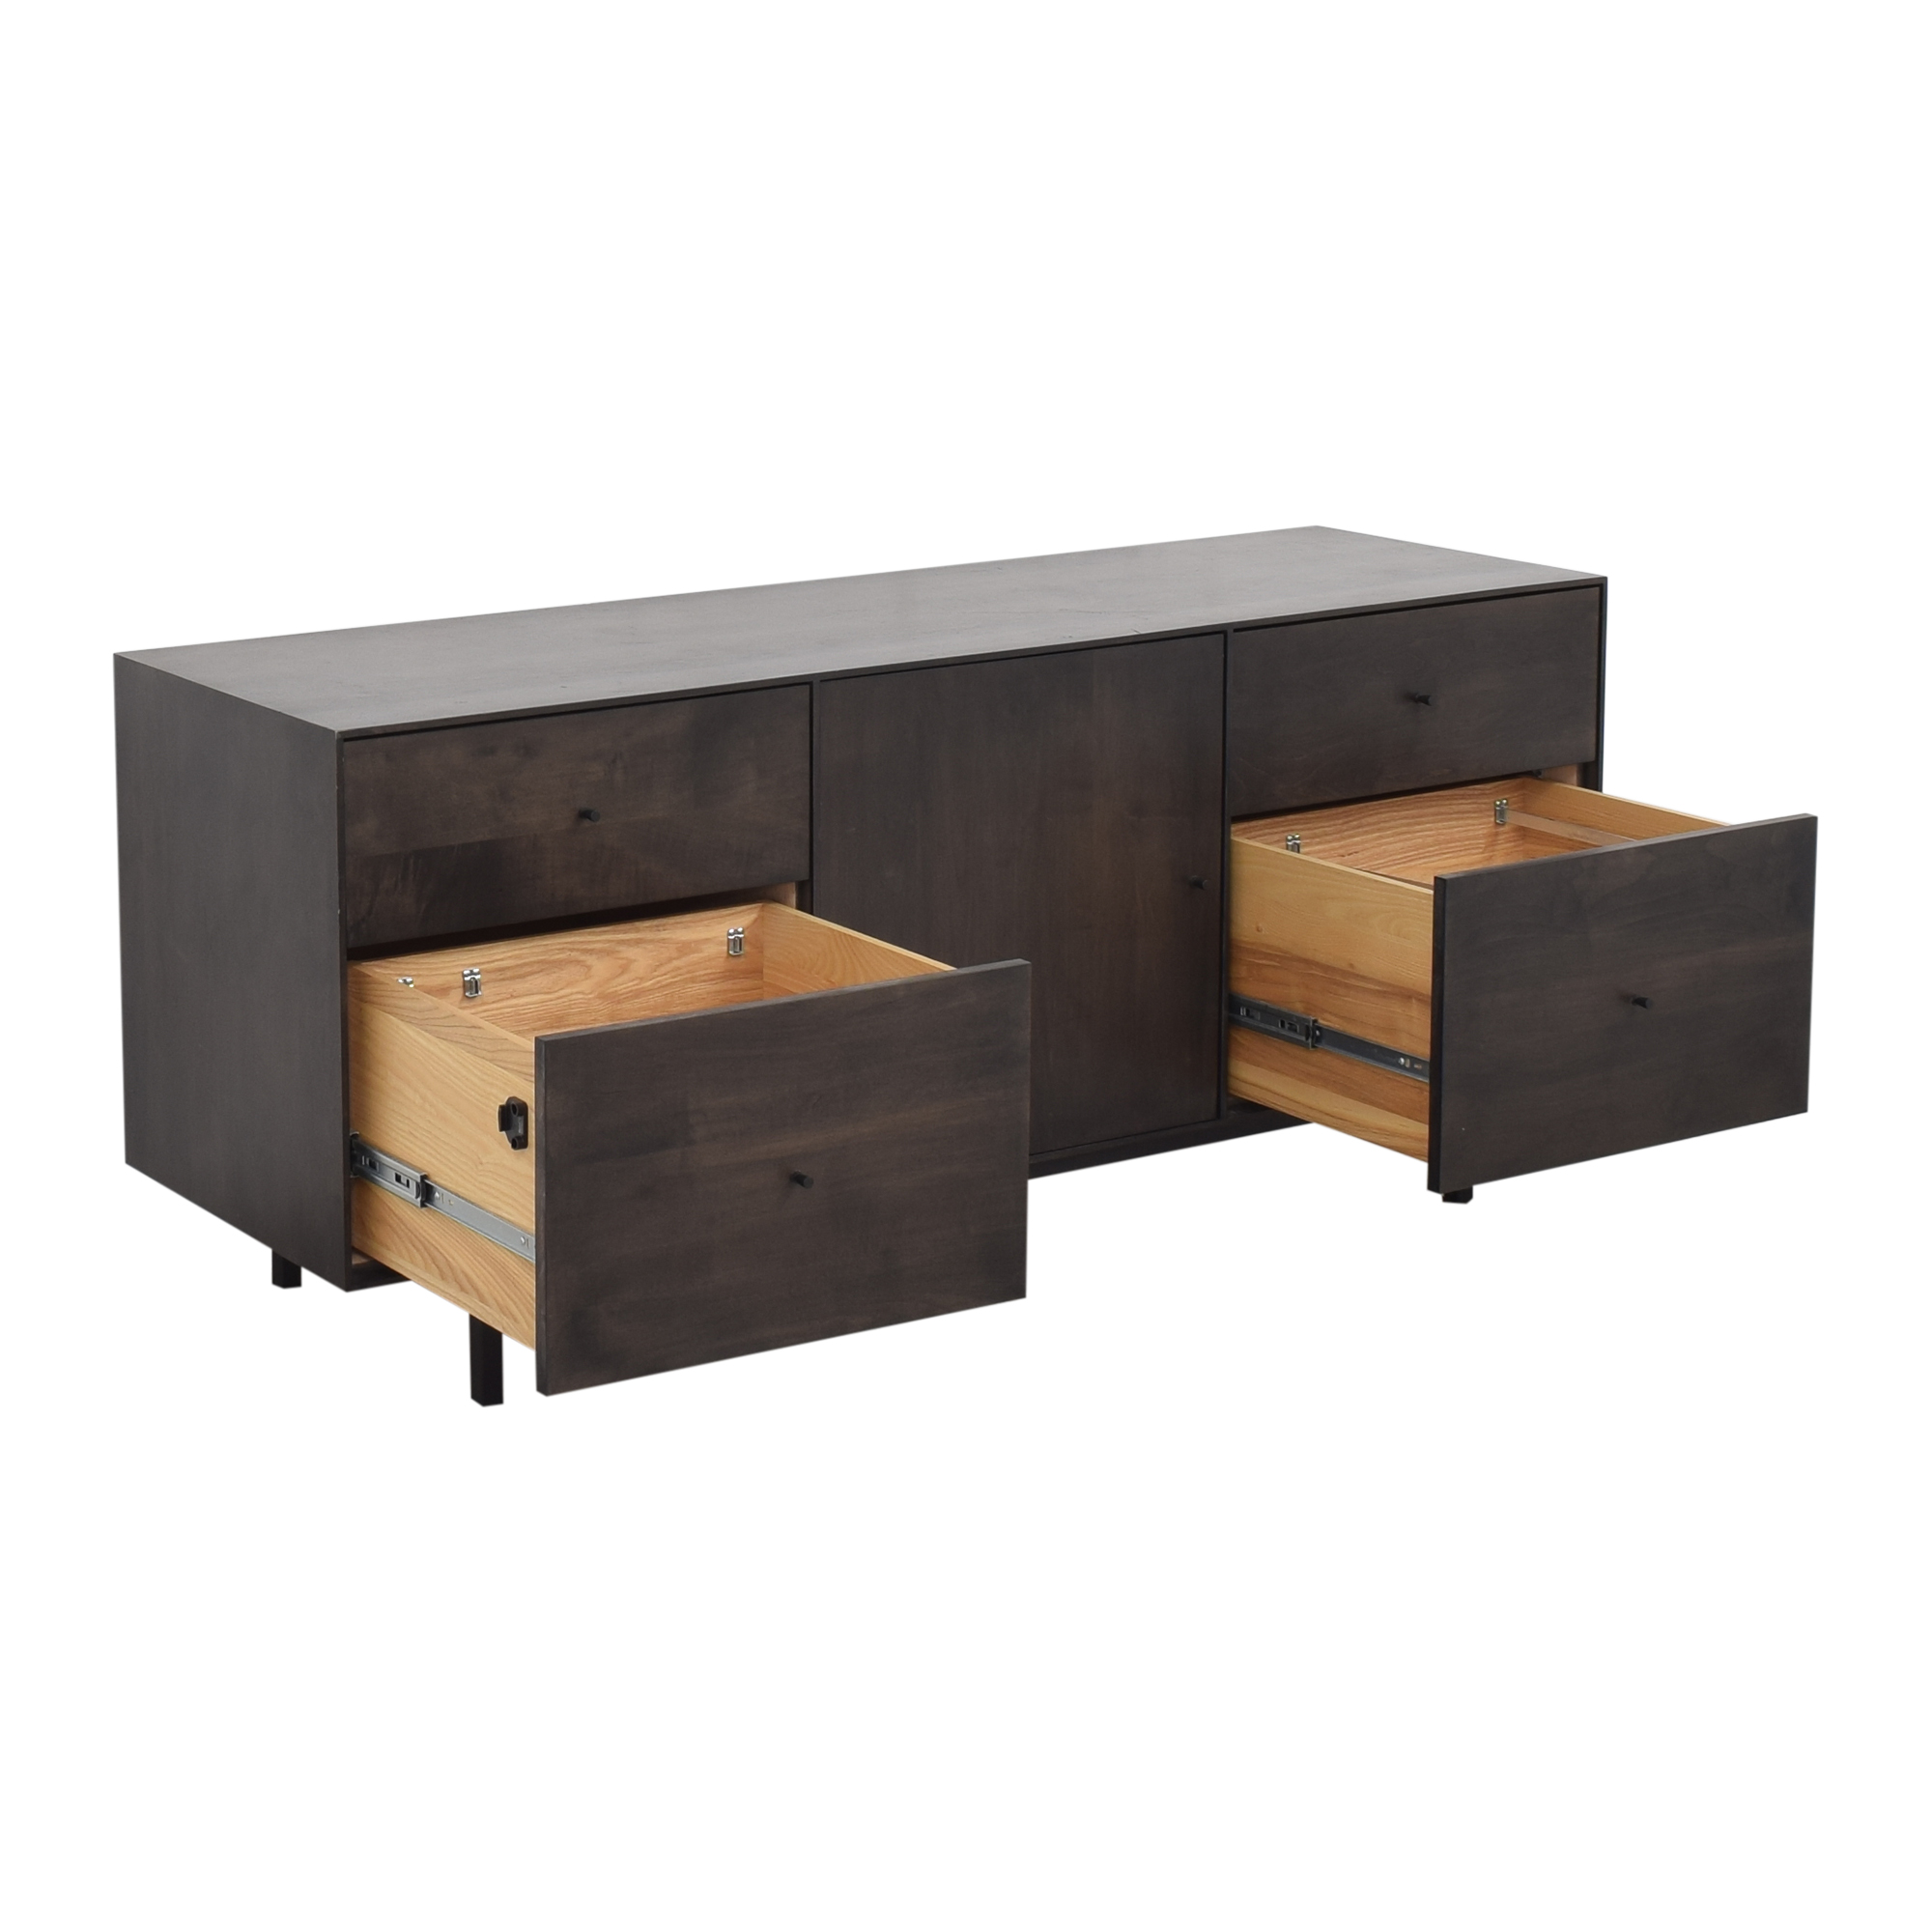 Room & Board Room & Board Hudson Custom Cabinet on sale